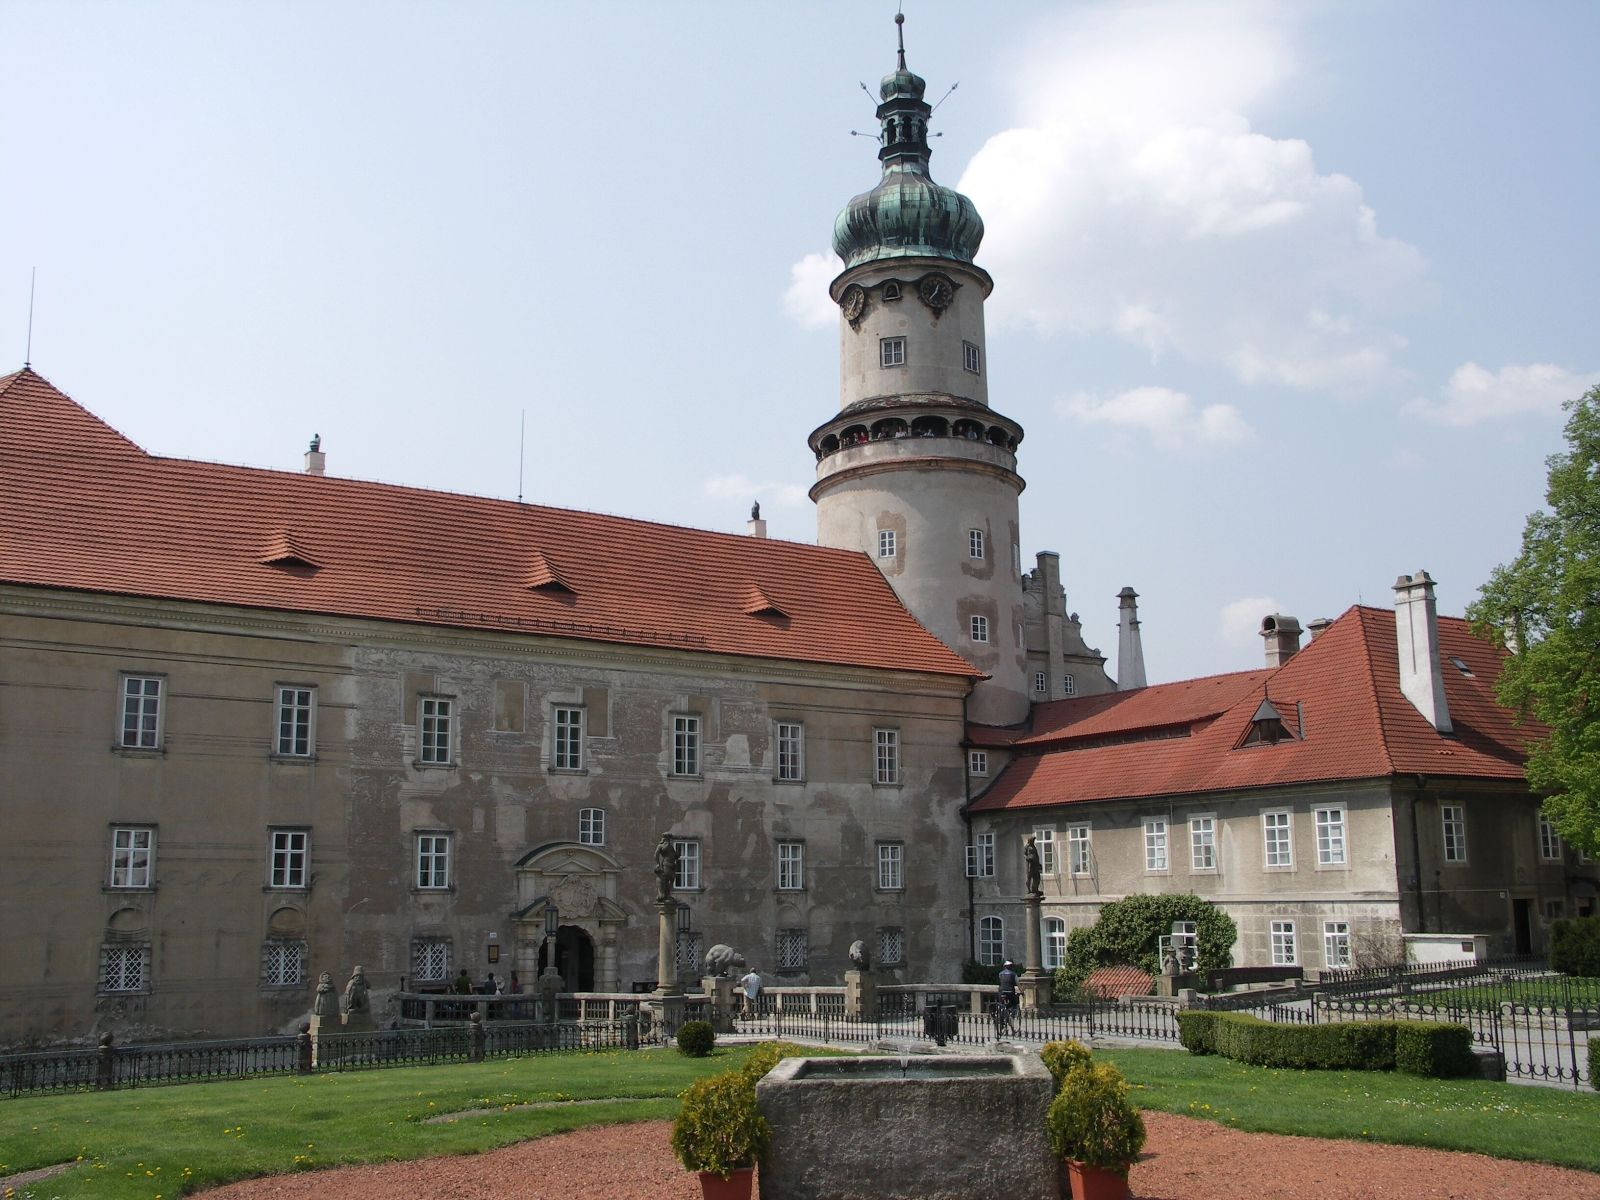 Schloss Nové Město nad Metují (Neustadt an der Mettau)